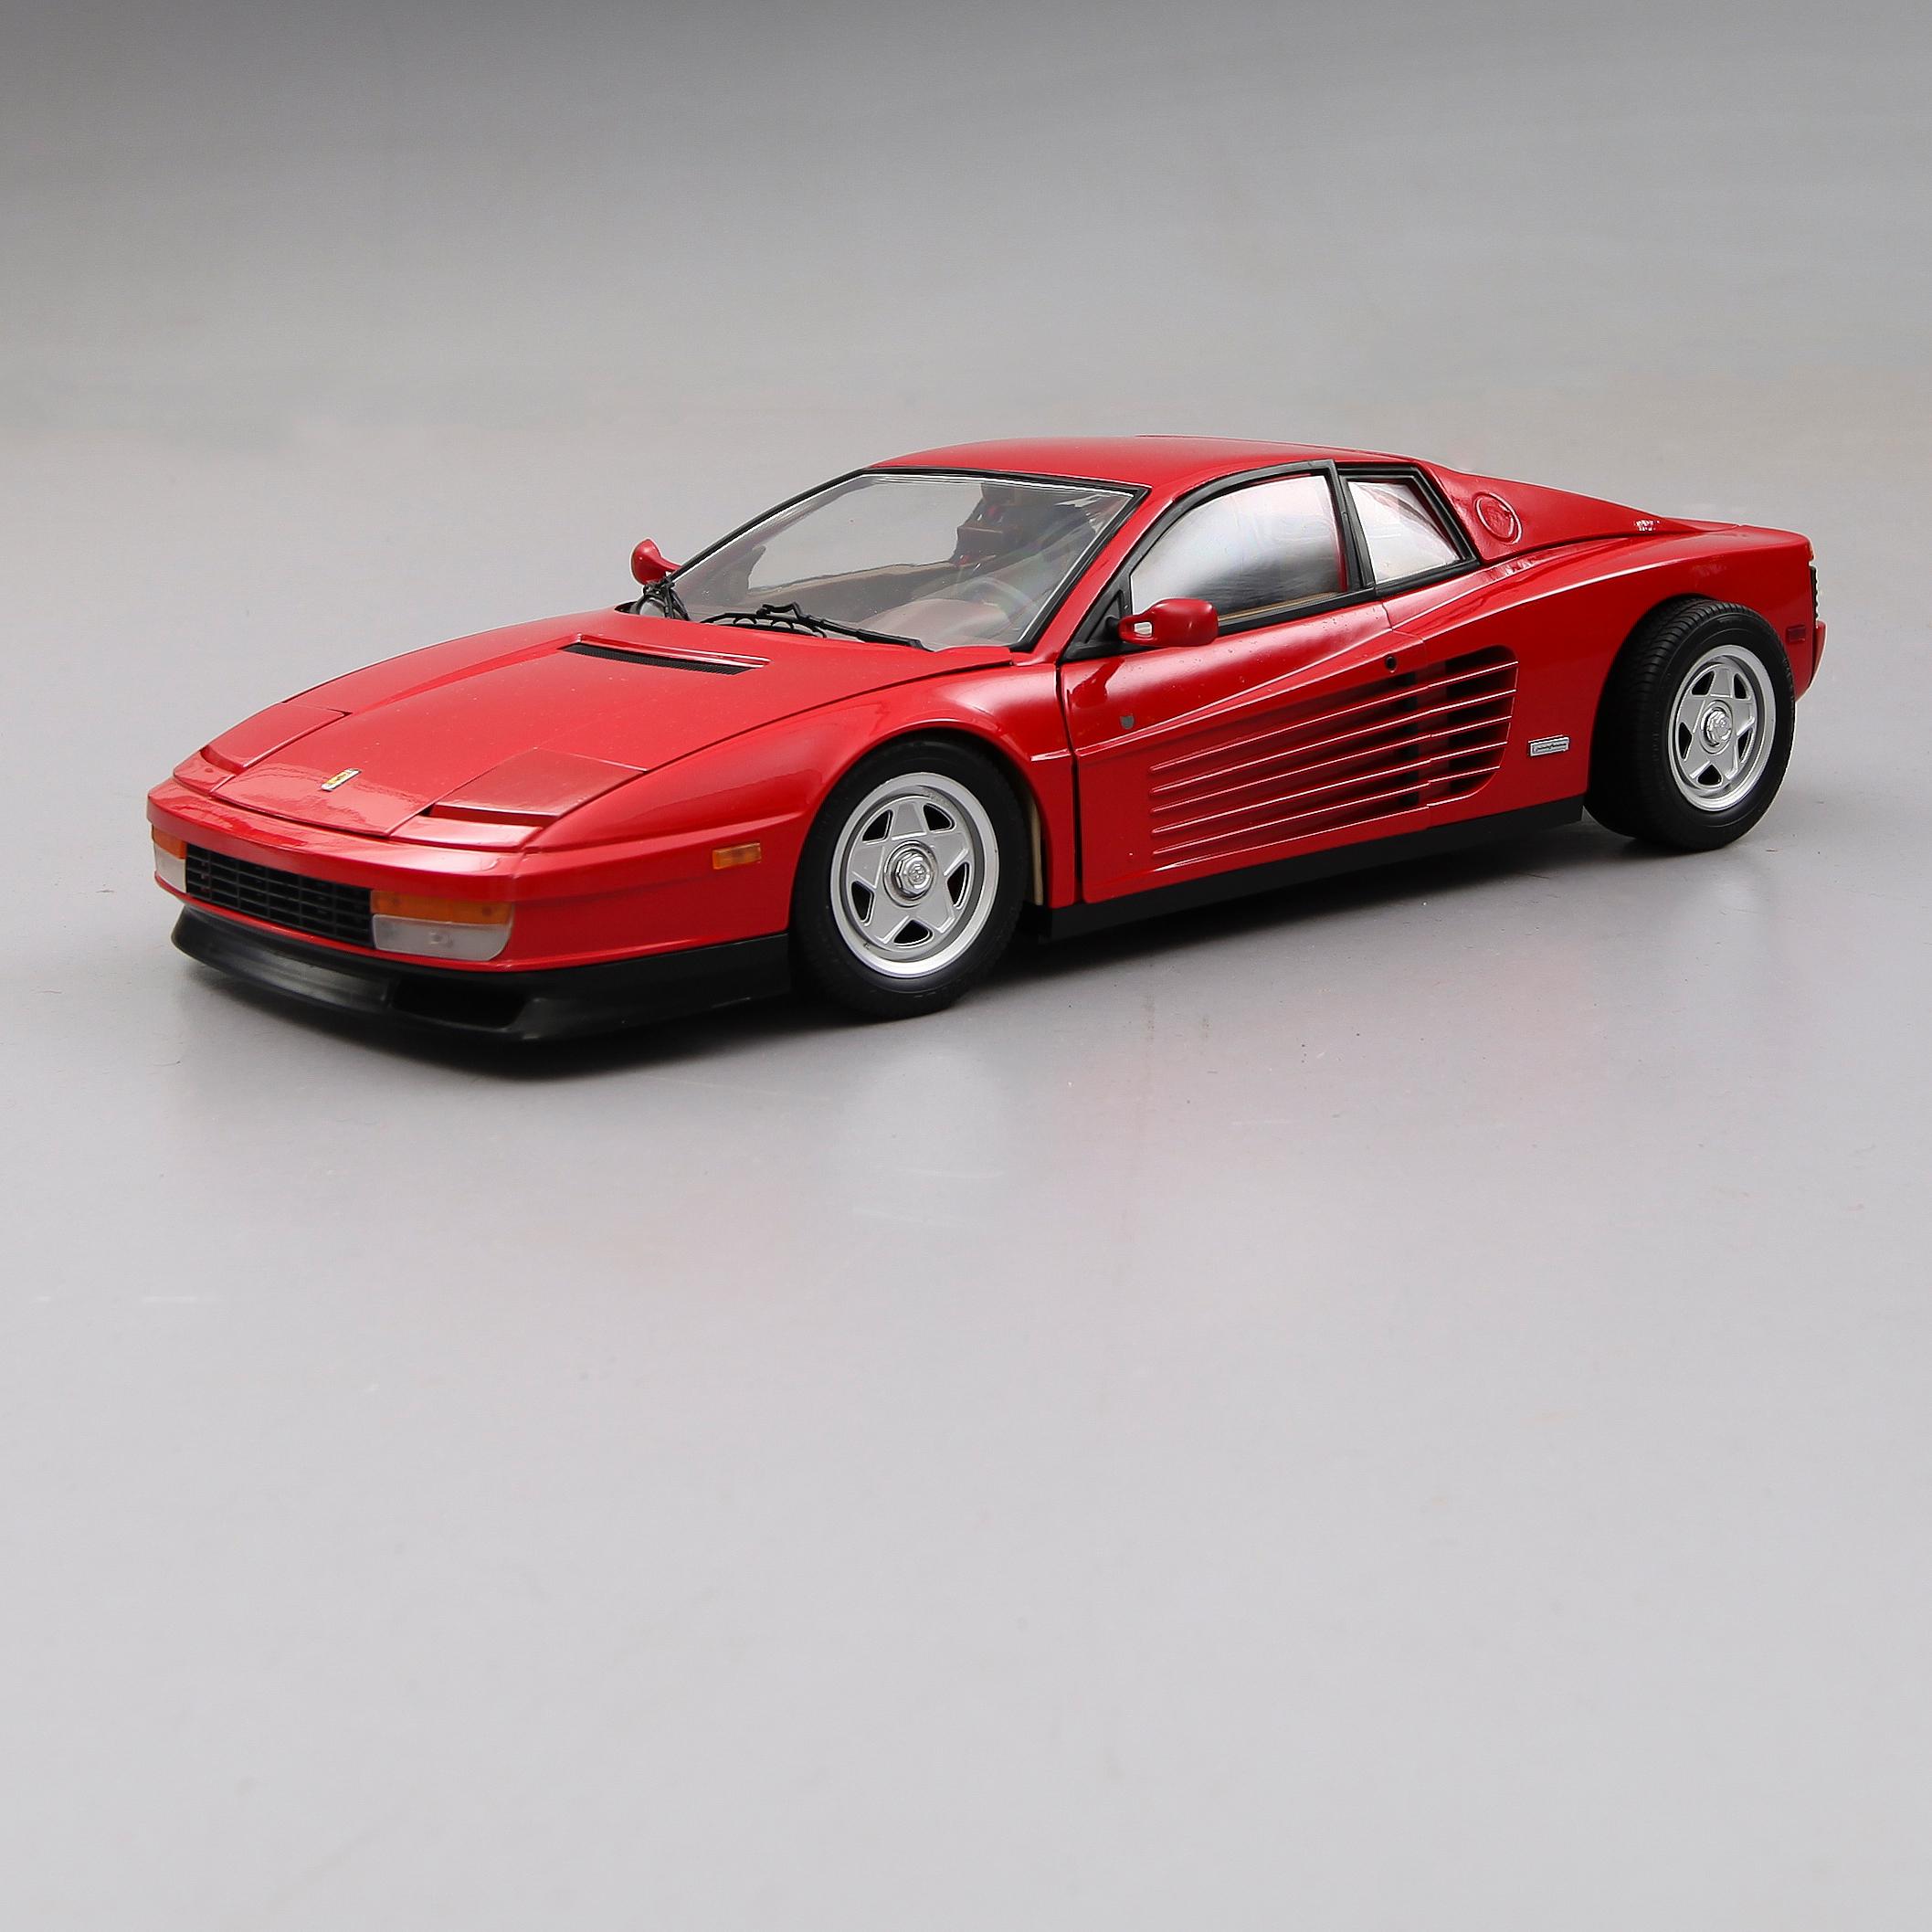 MODELLBIL, Pocher Ferrari Testarossa, skala 1/8. - Bukowskis